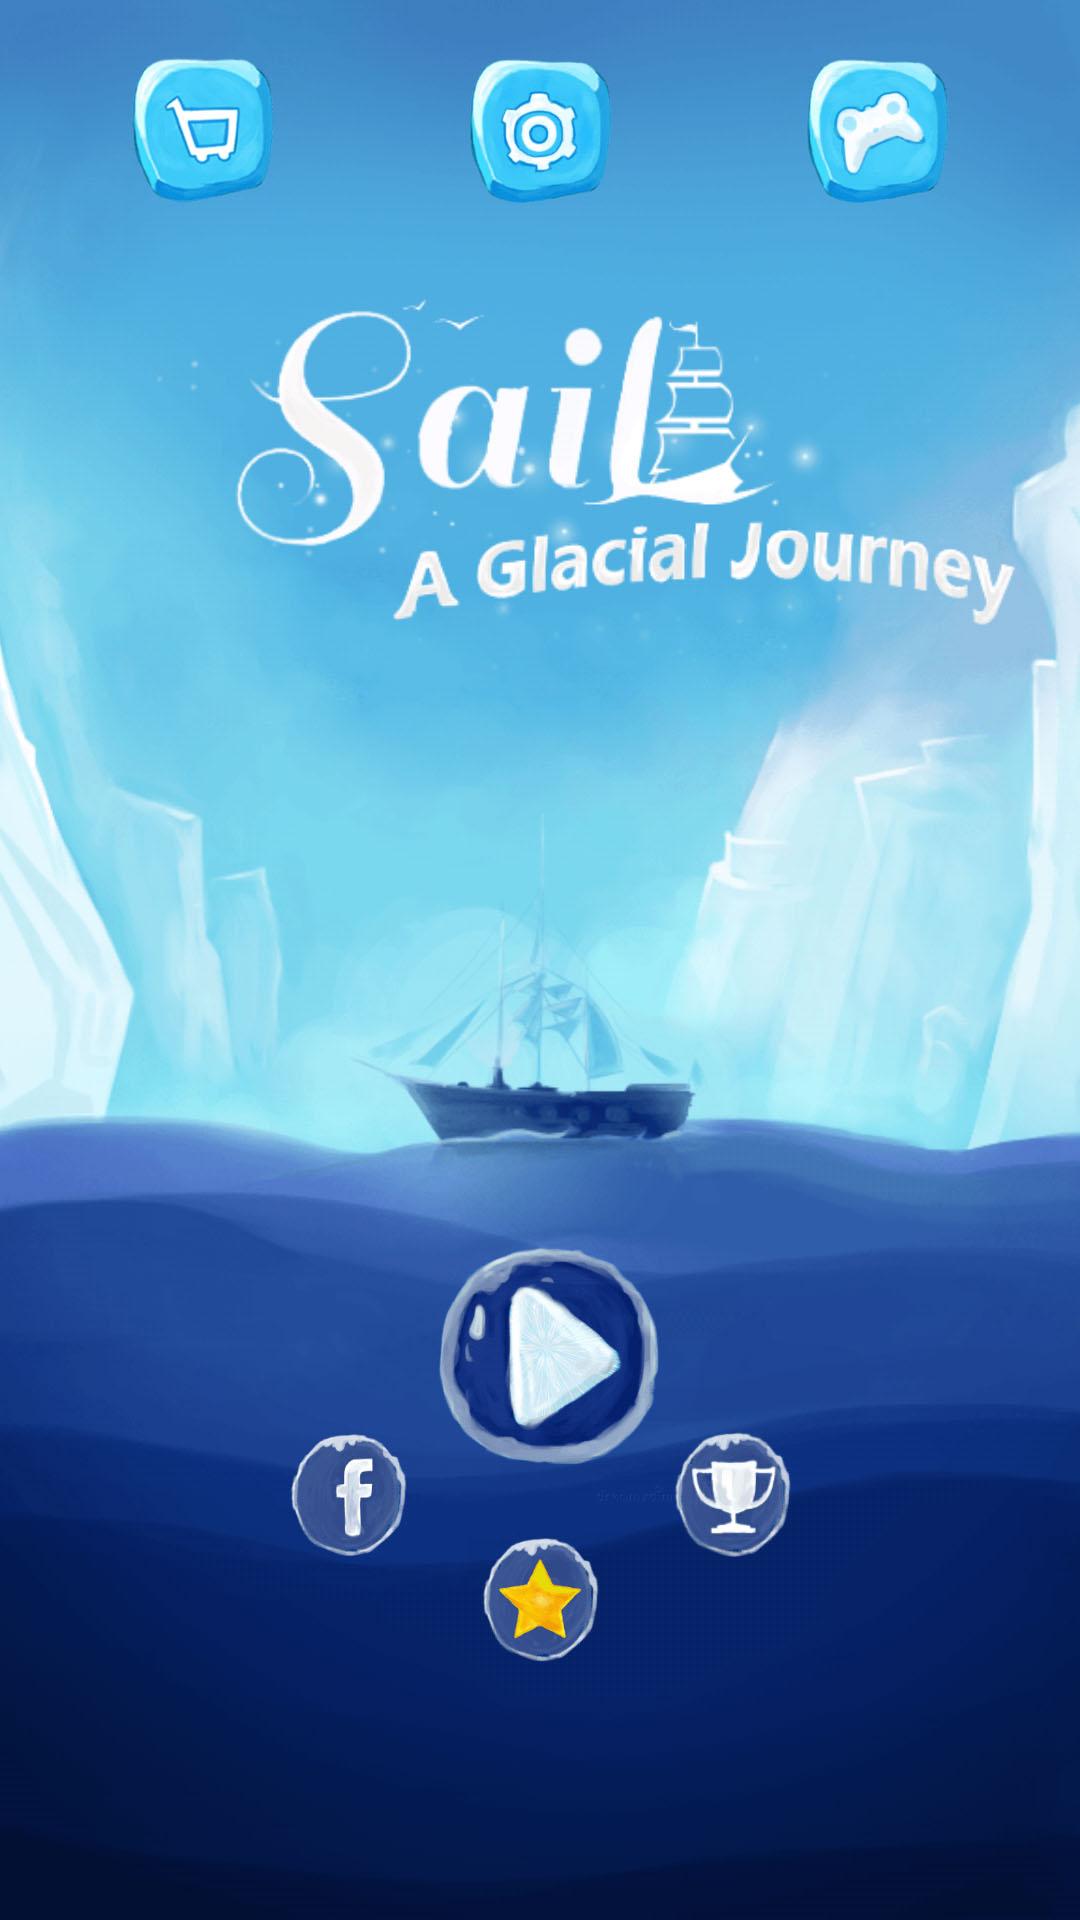 Sail:A Glacial Journey